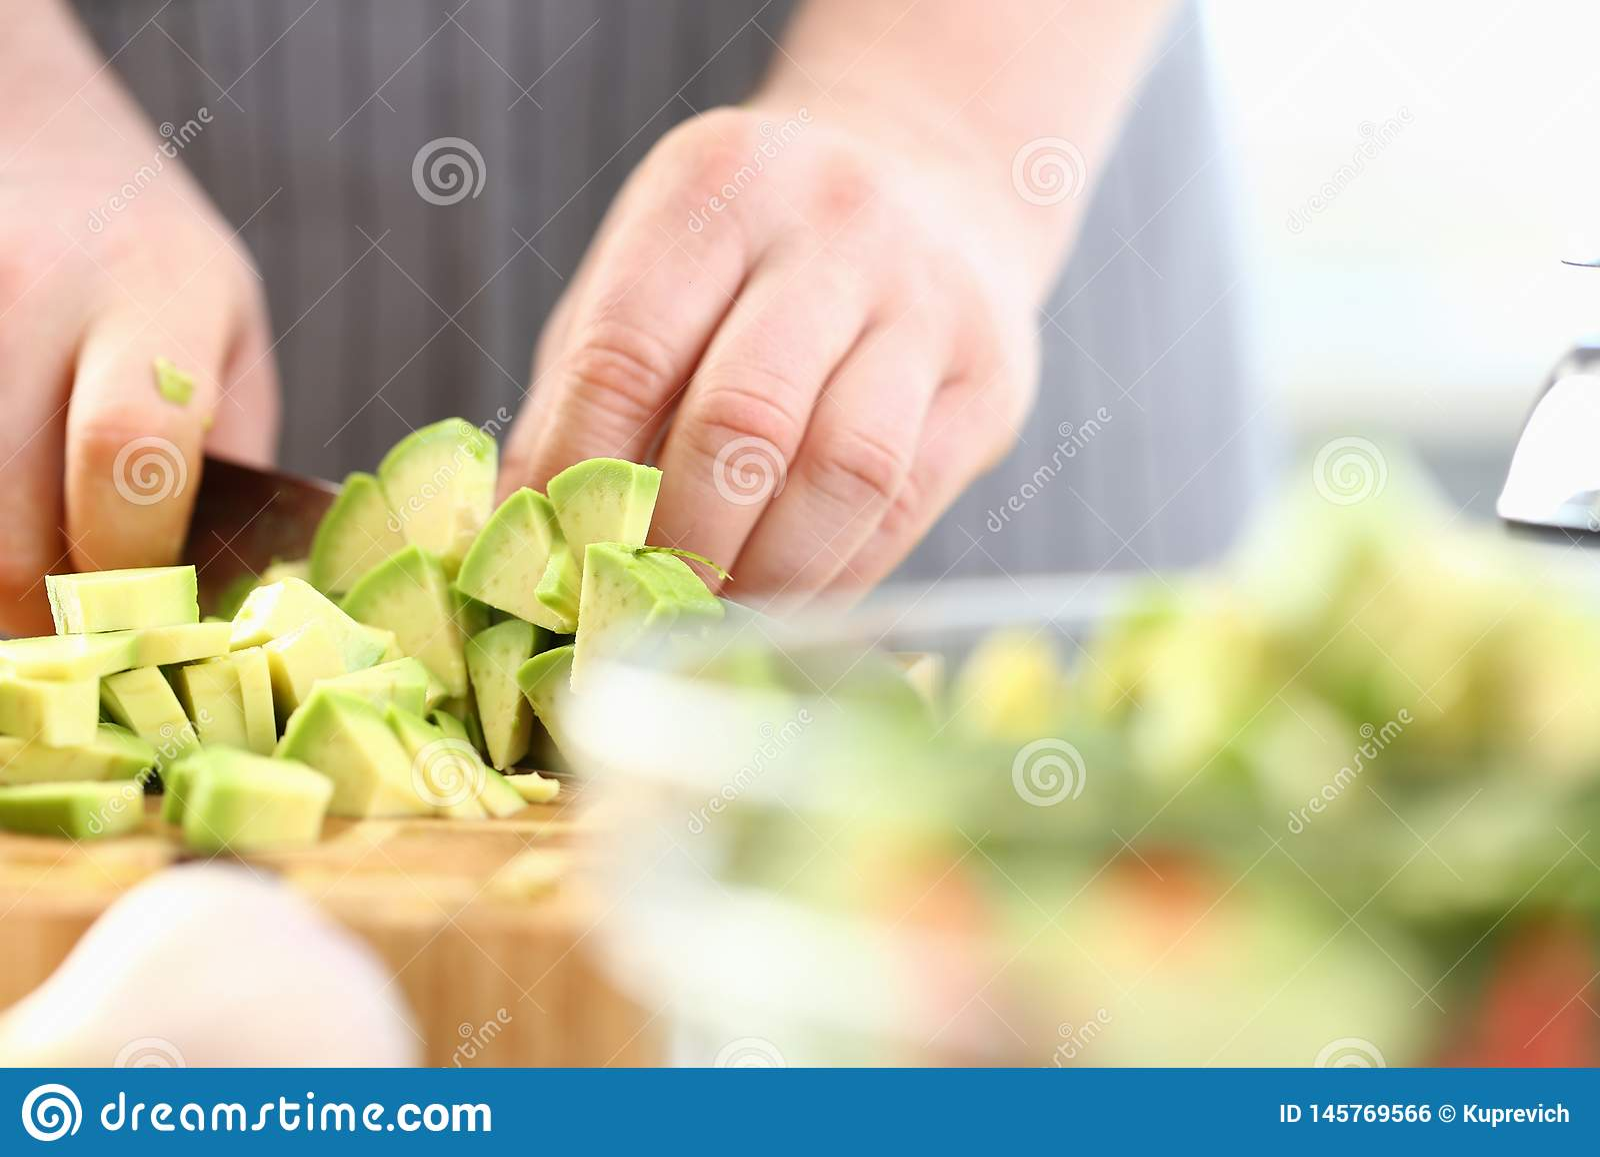 Berufschef-Hands Chopping Exotic-Avocado